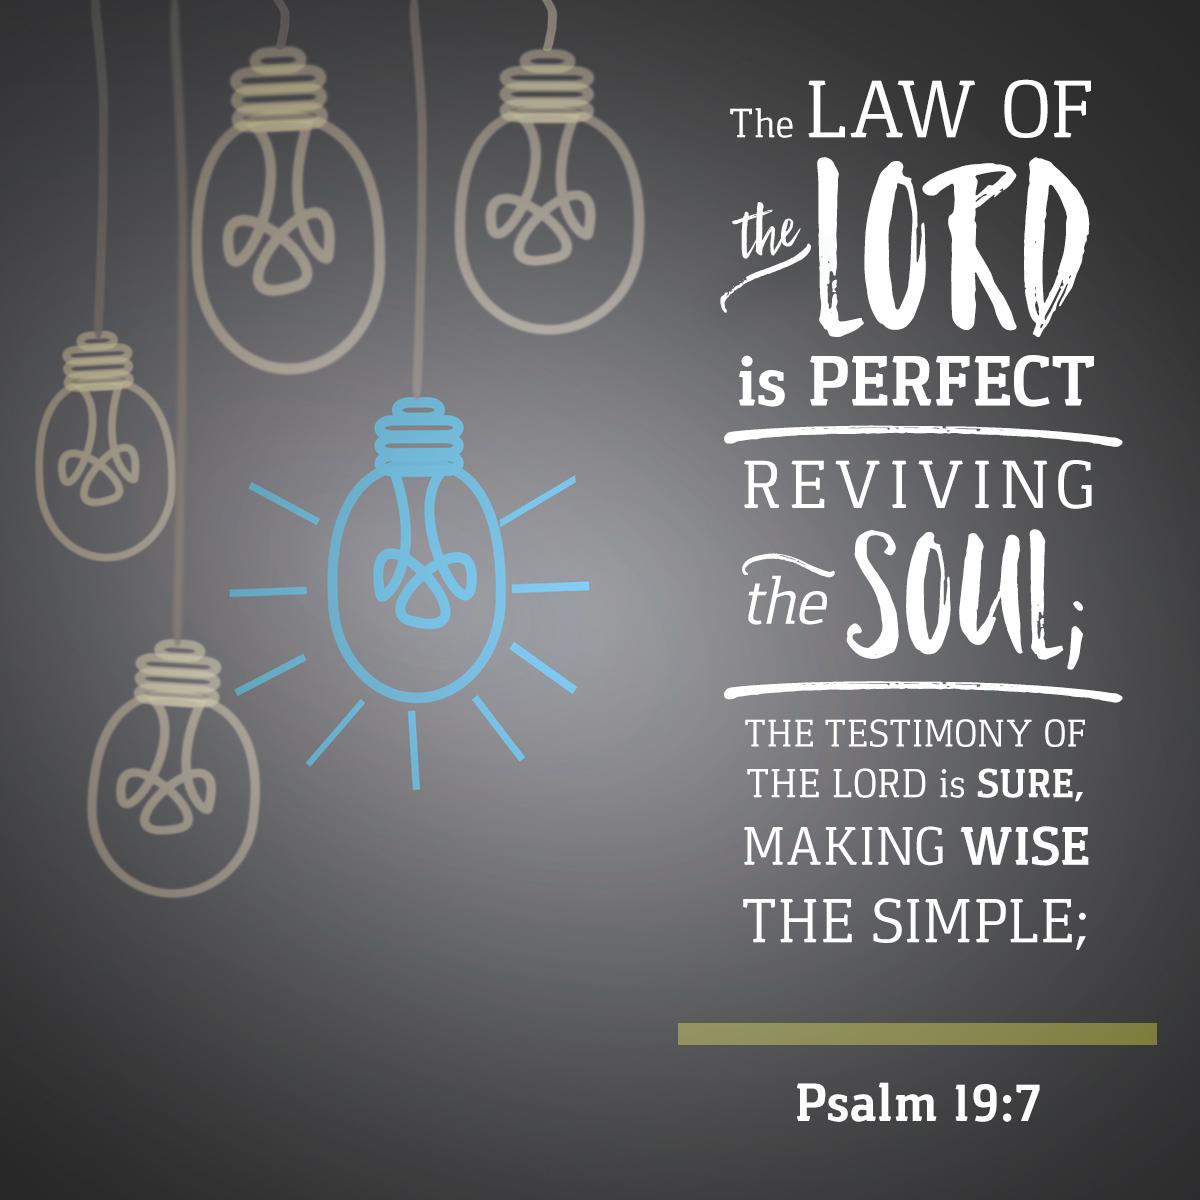 Psalm 19:7